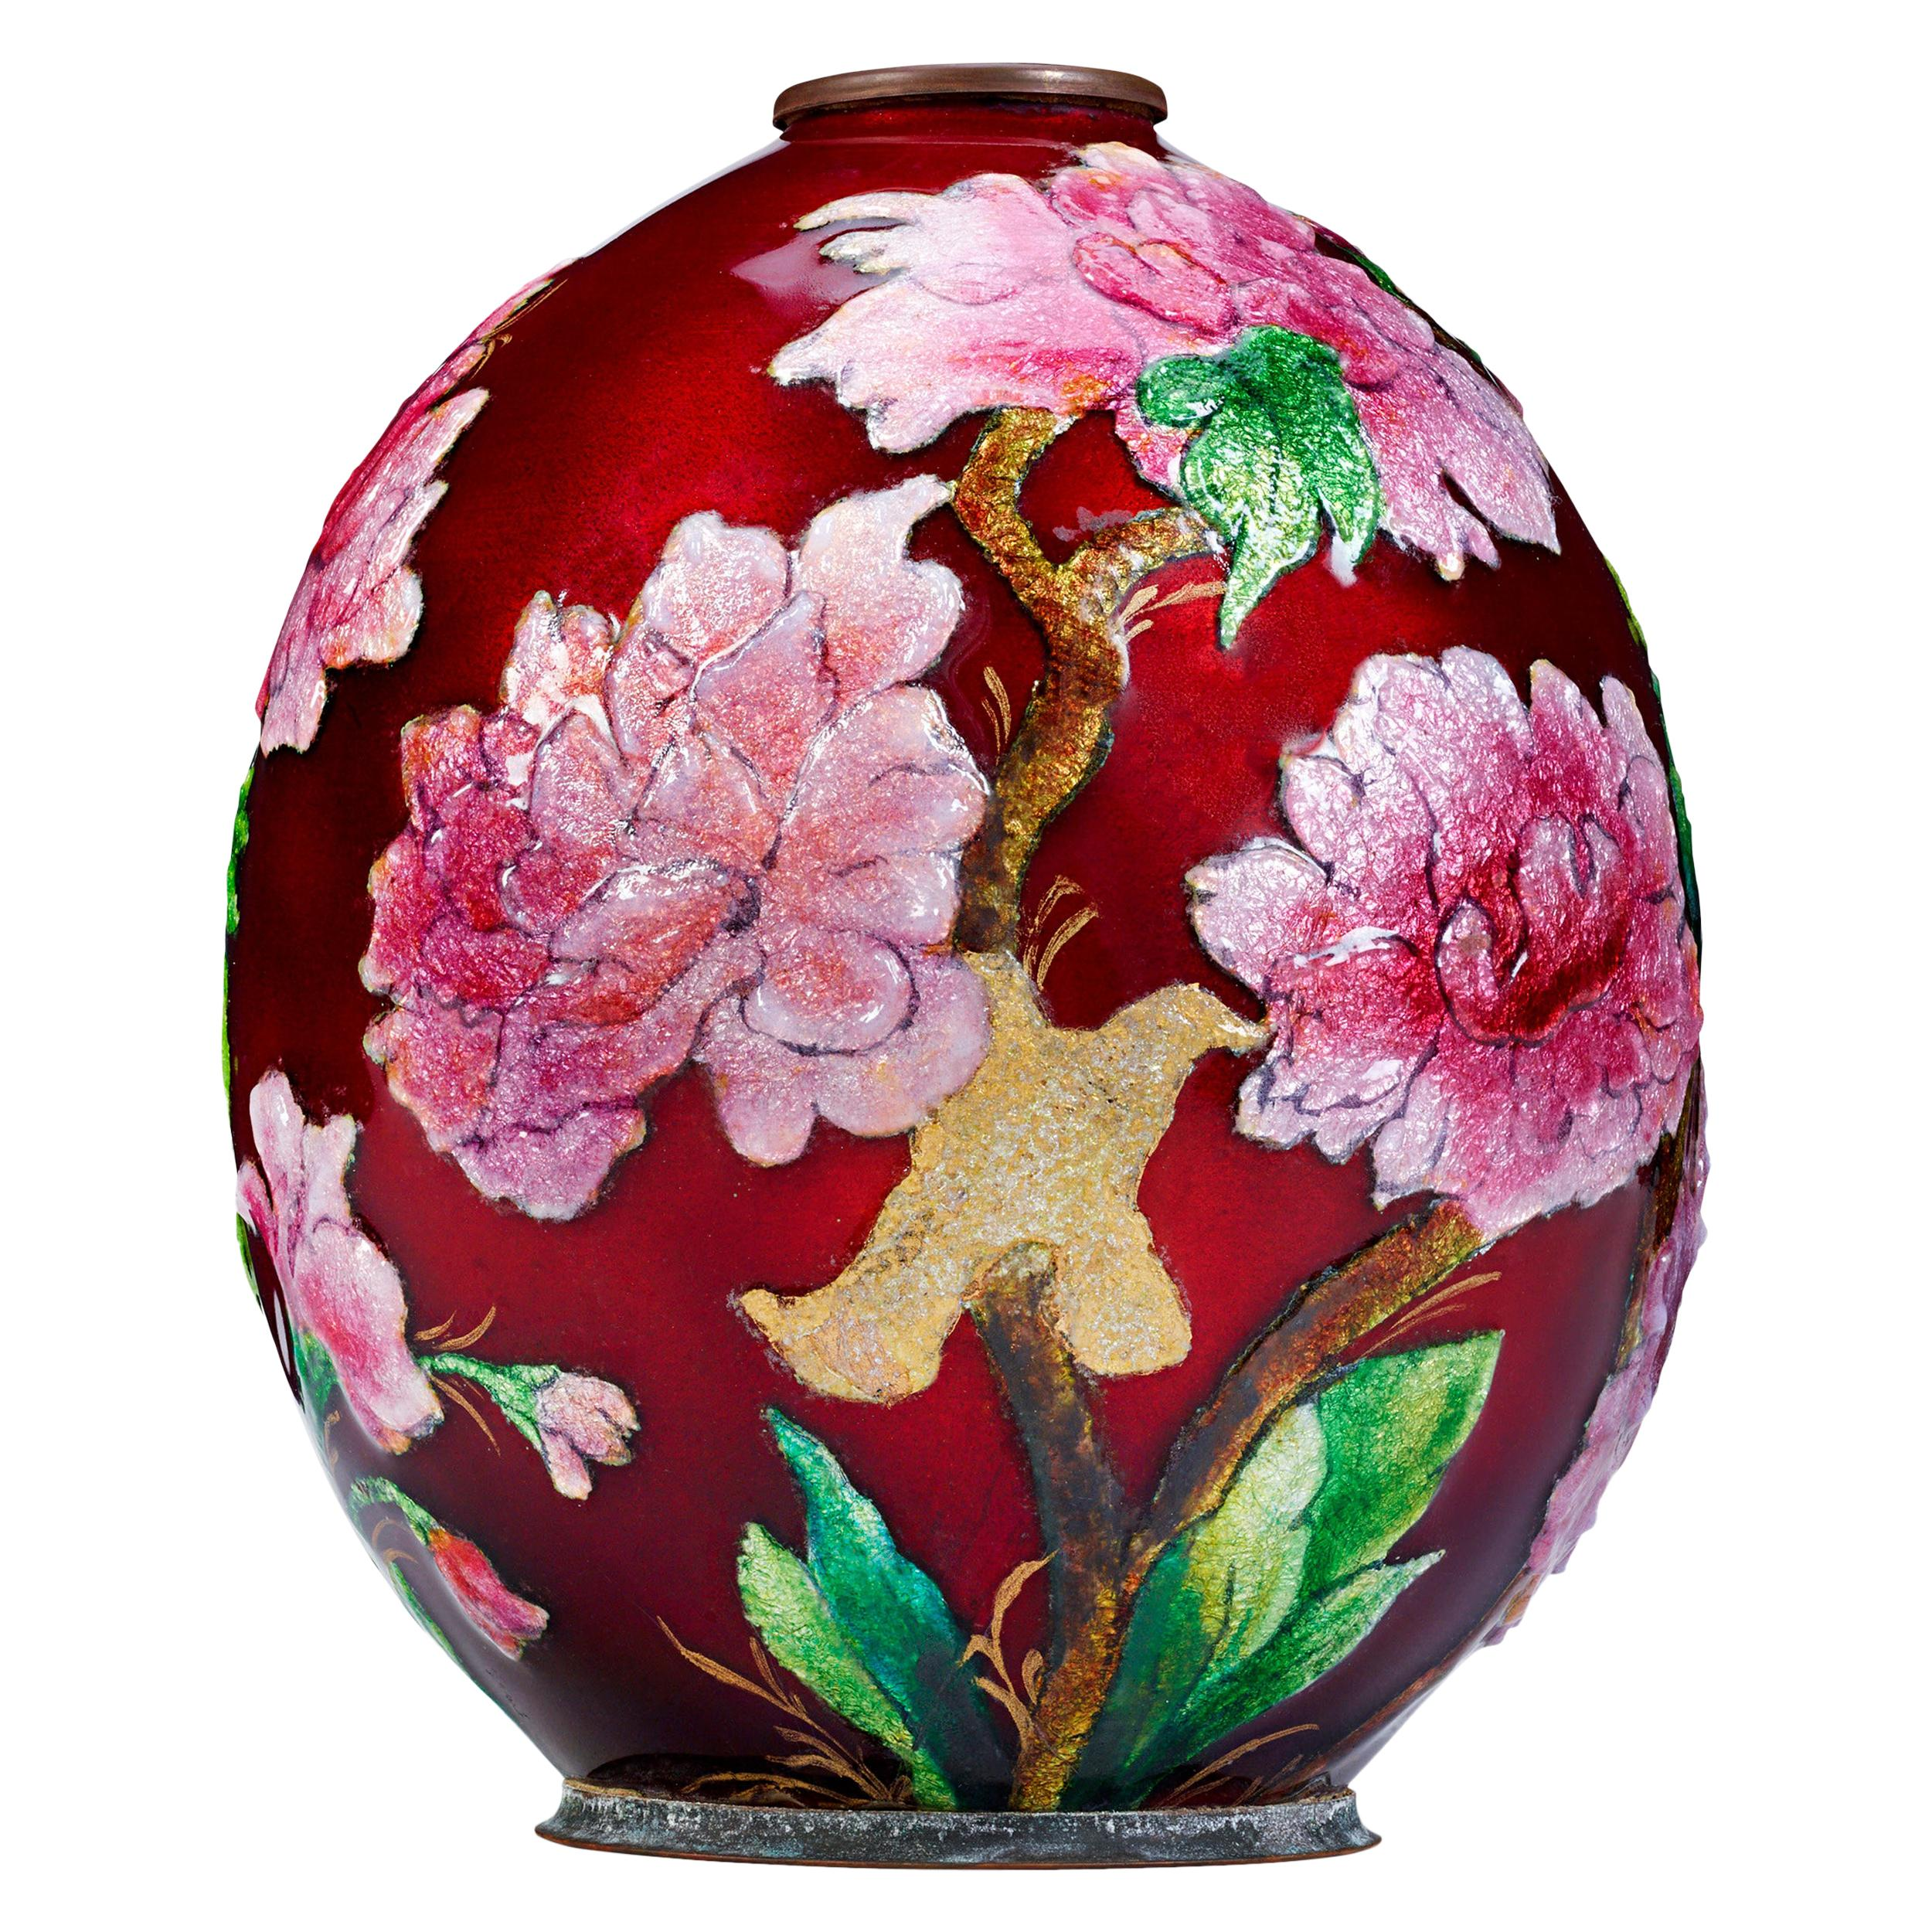 Enameled Floral Vase by Camille Fauré